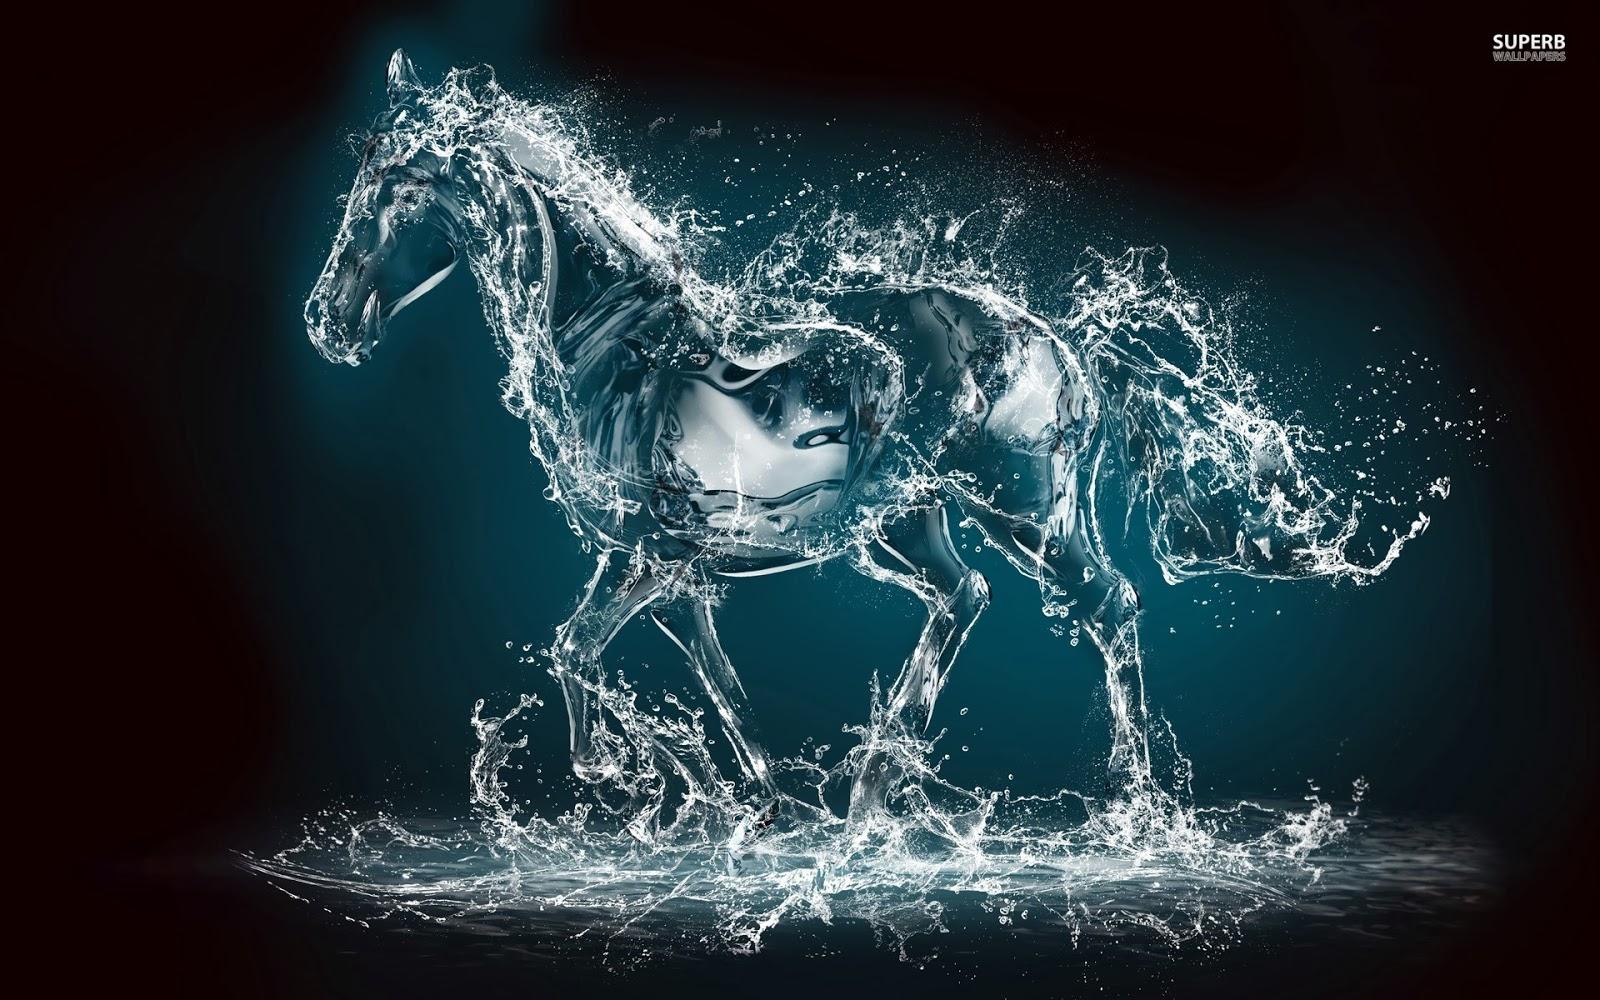 Water Horse Wallpaper - HD Wallpapers Blog